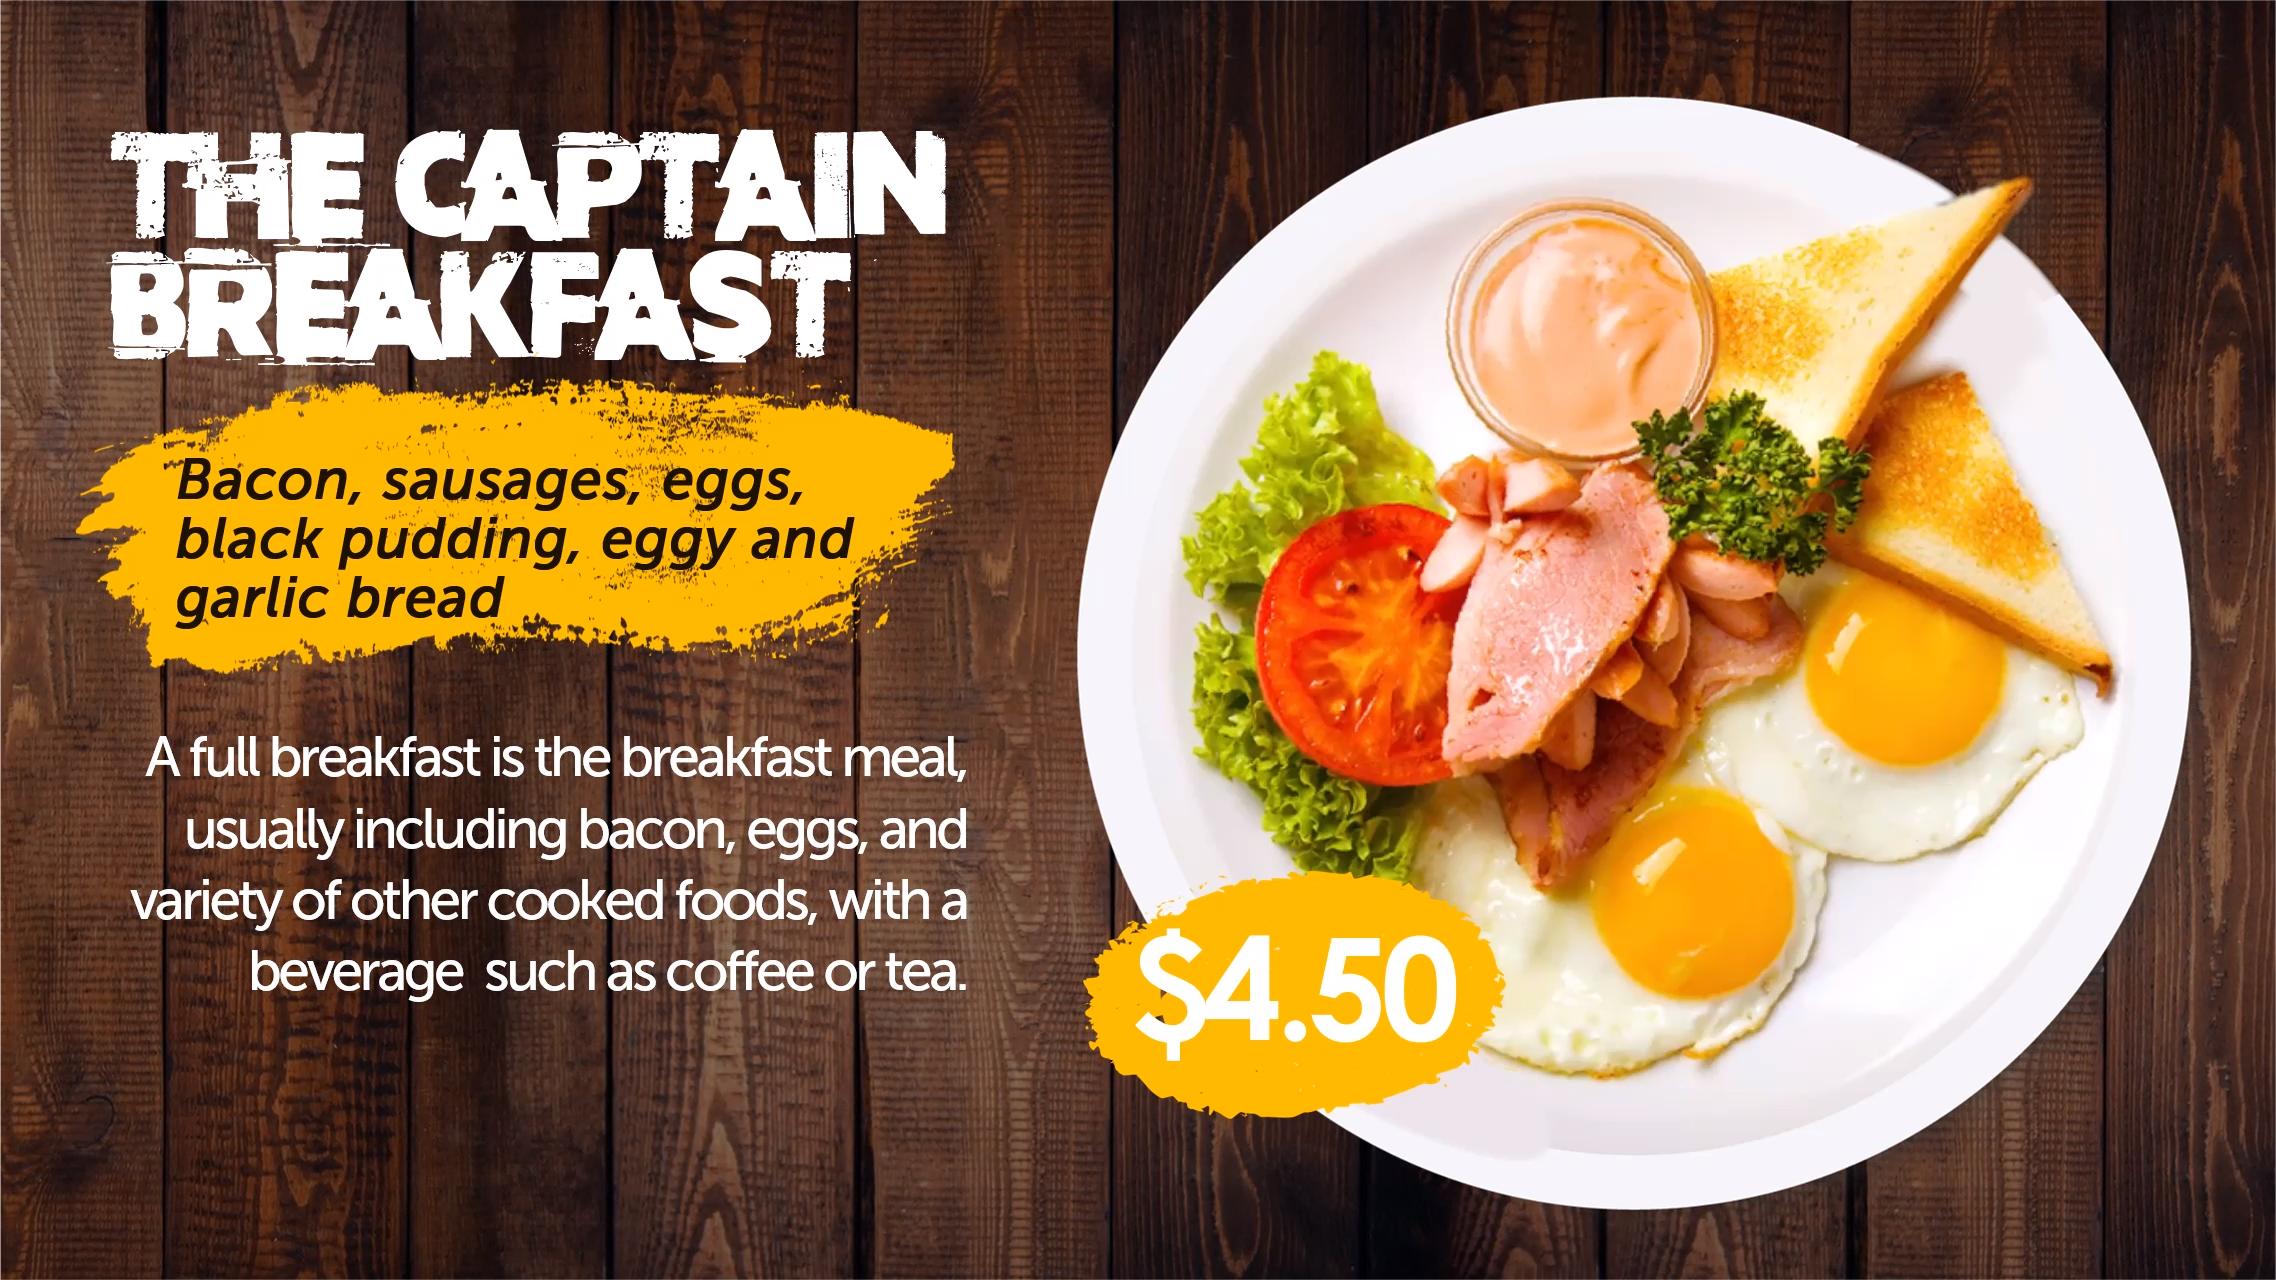 Food promotion digital signage template